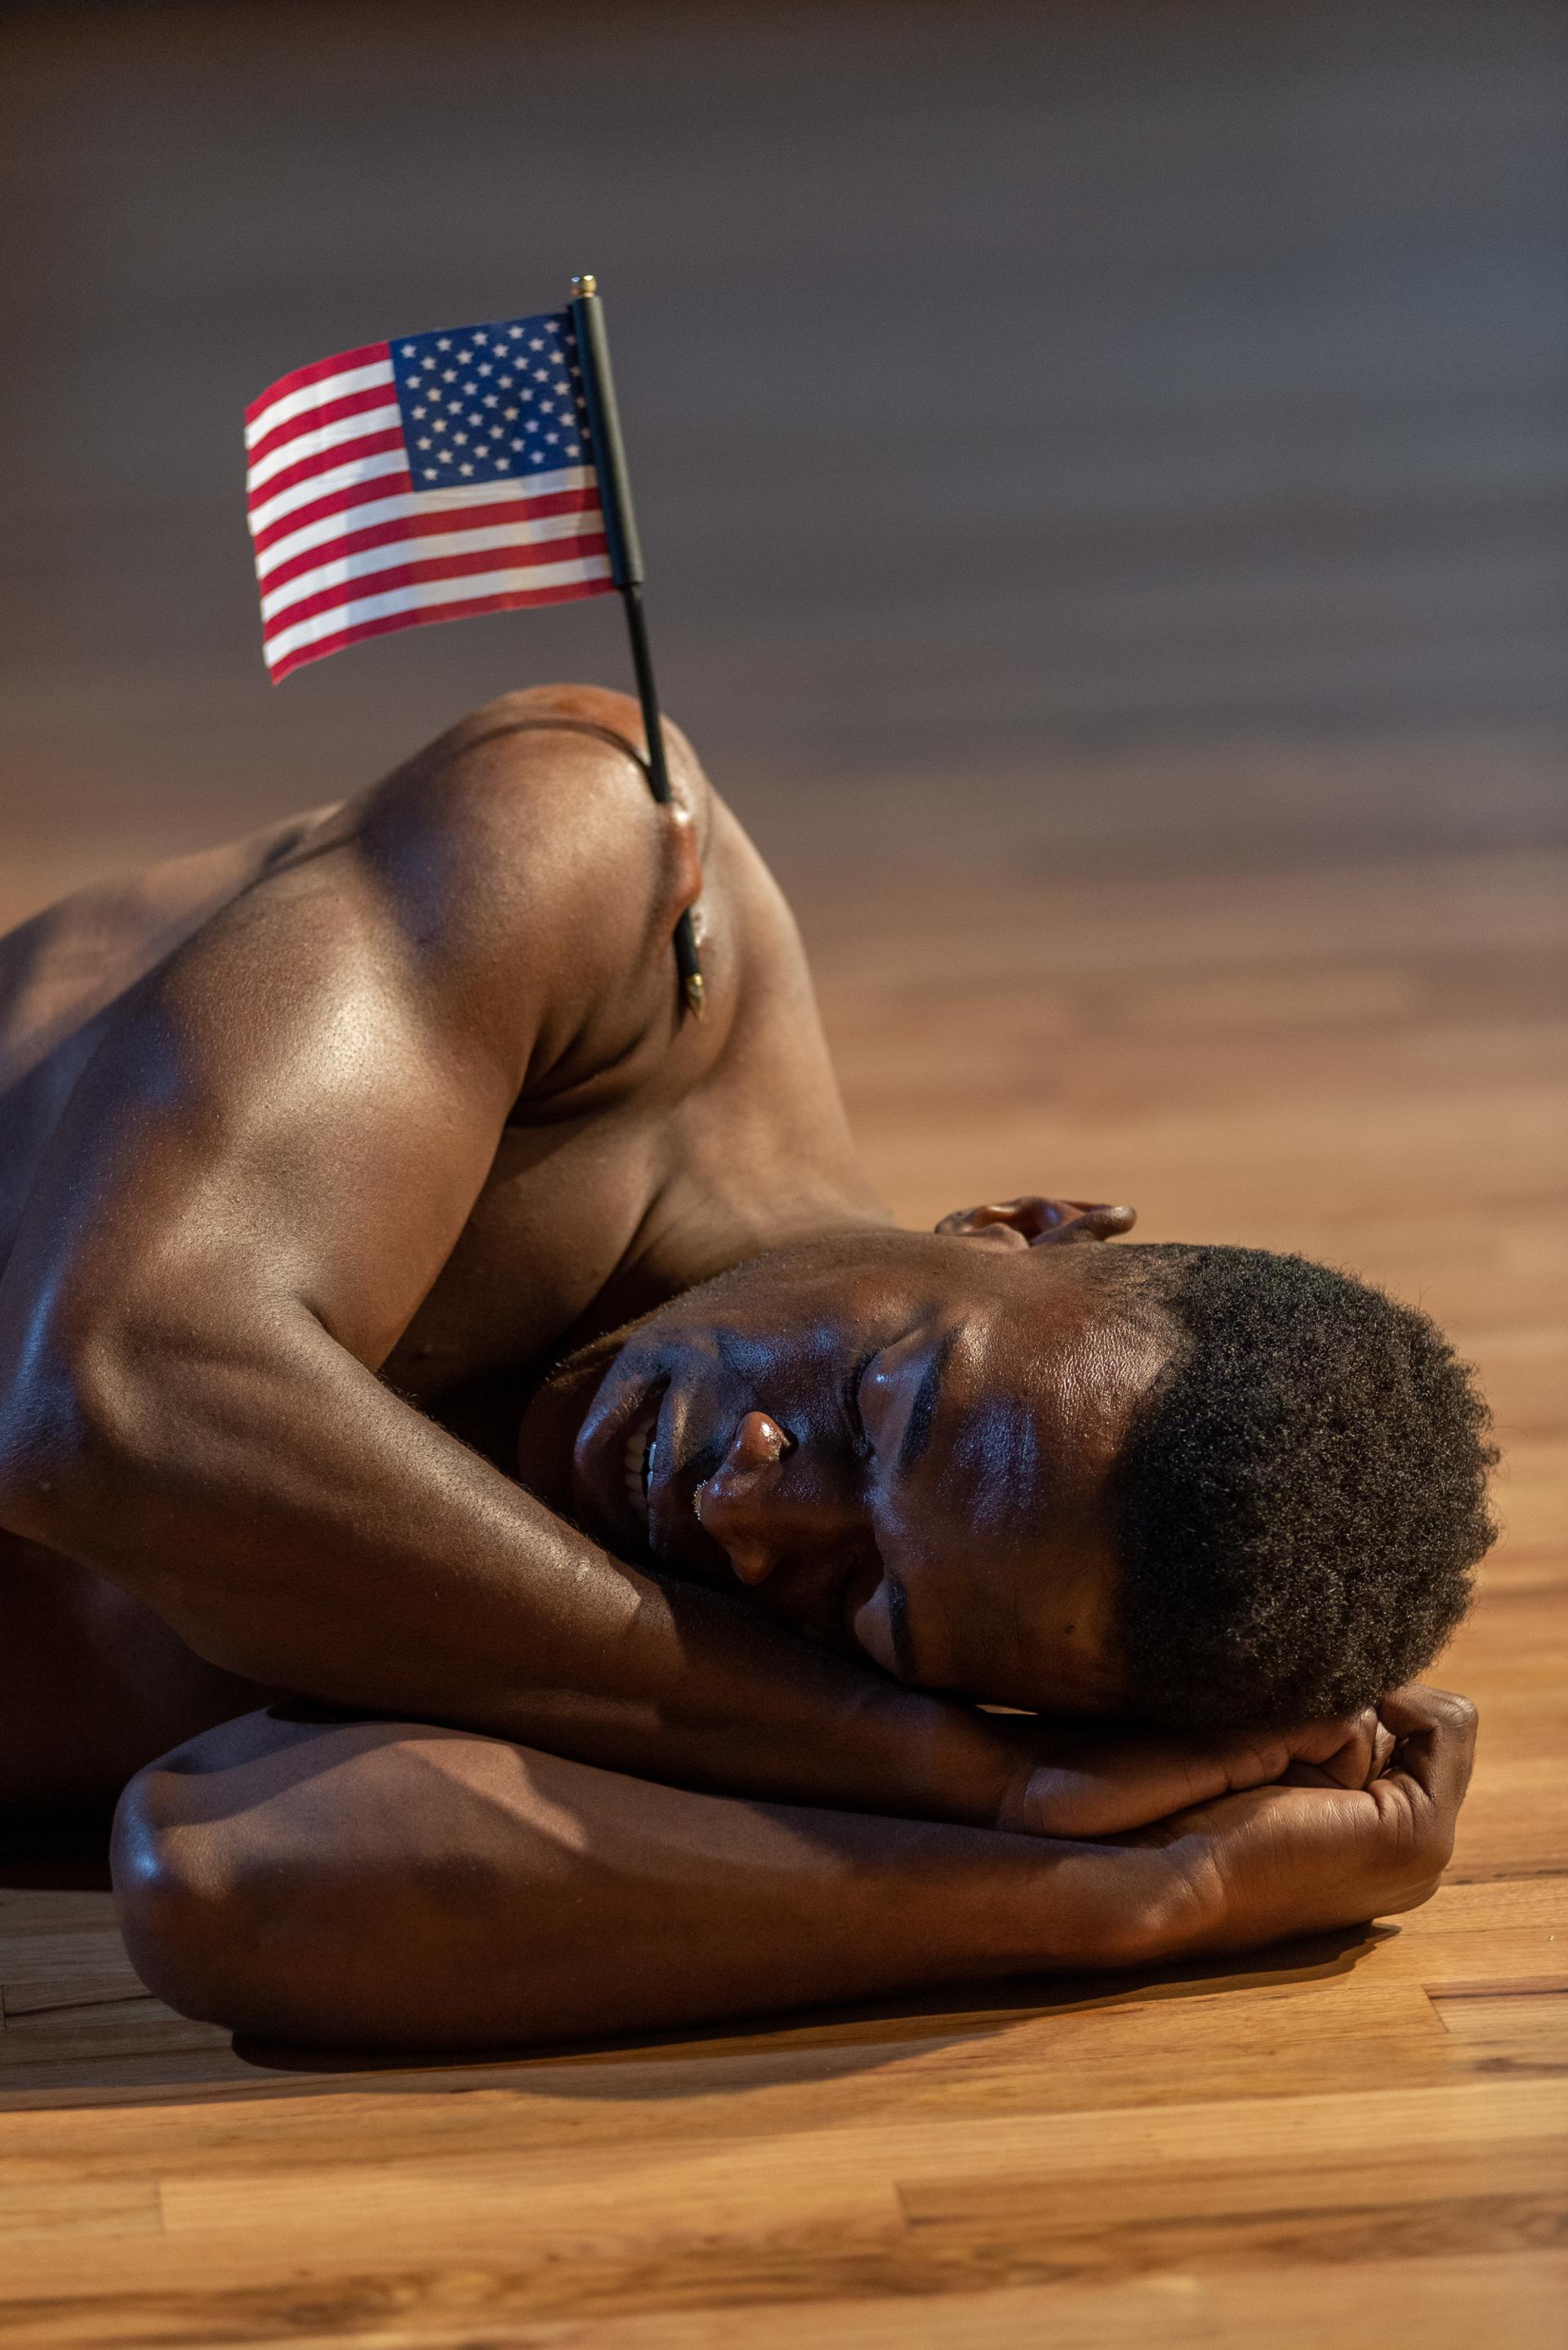 South Body by Carlos Martiel